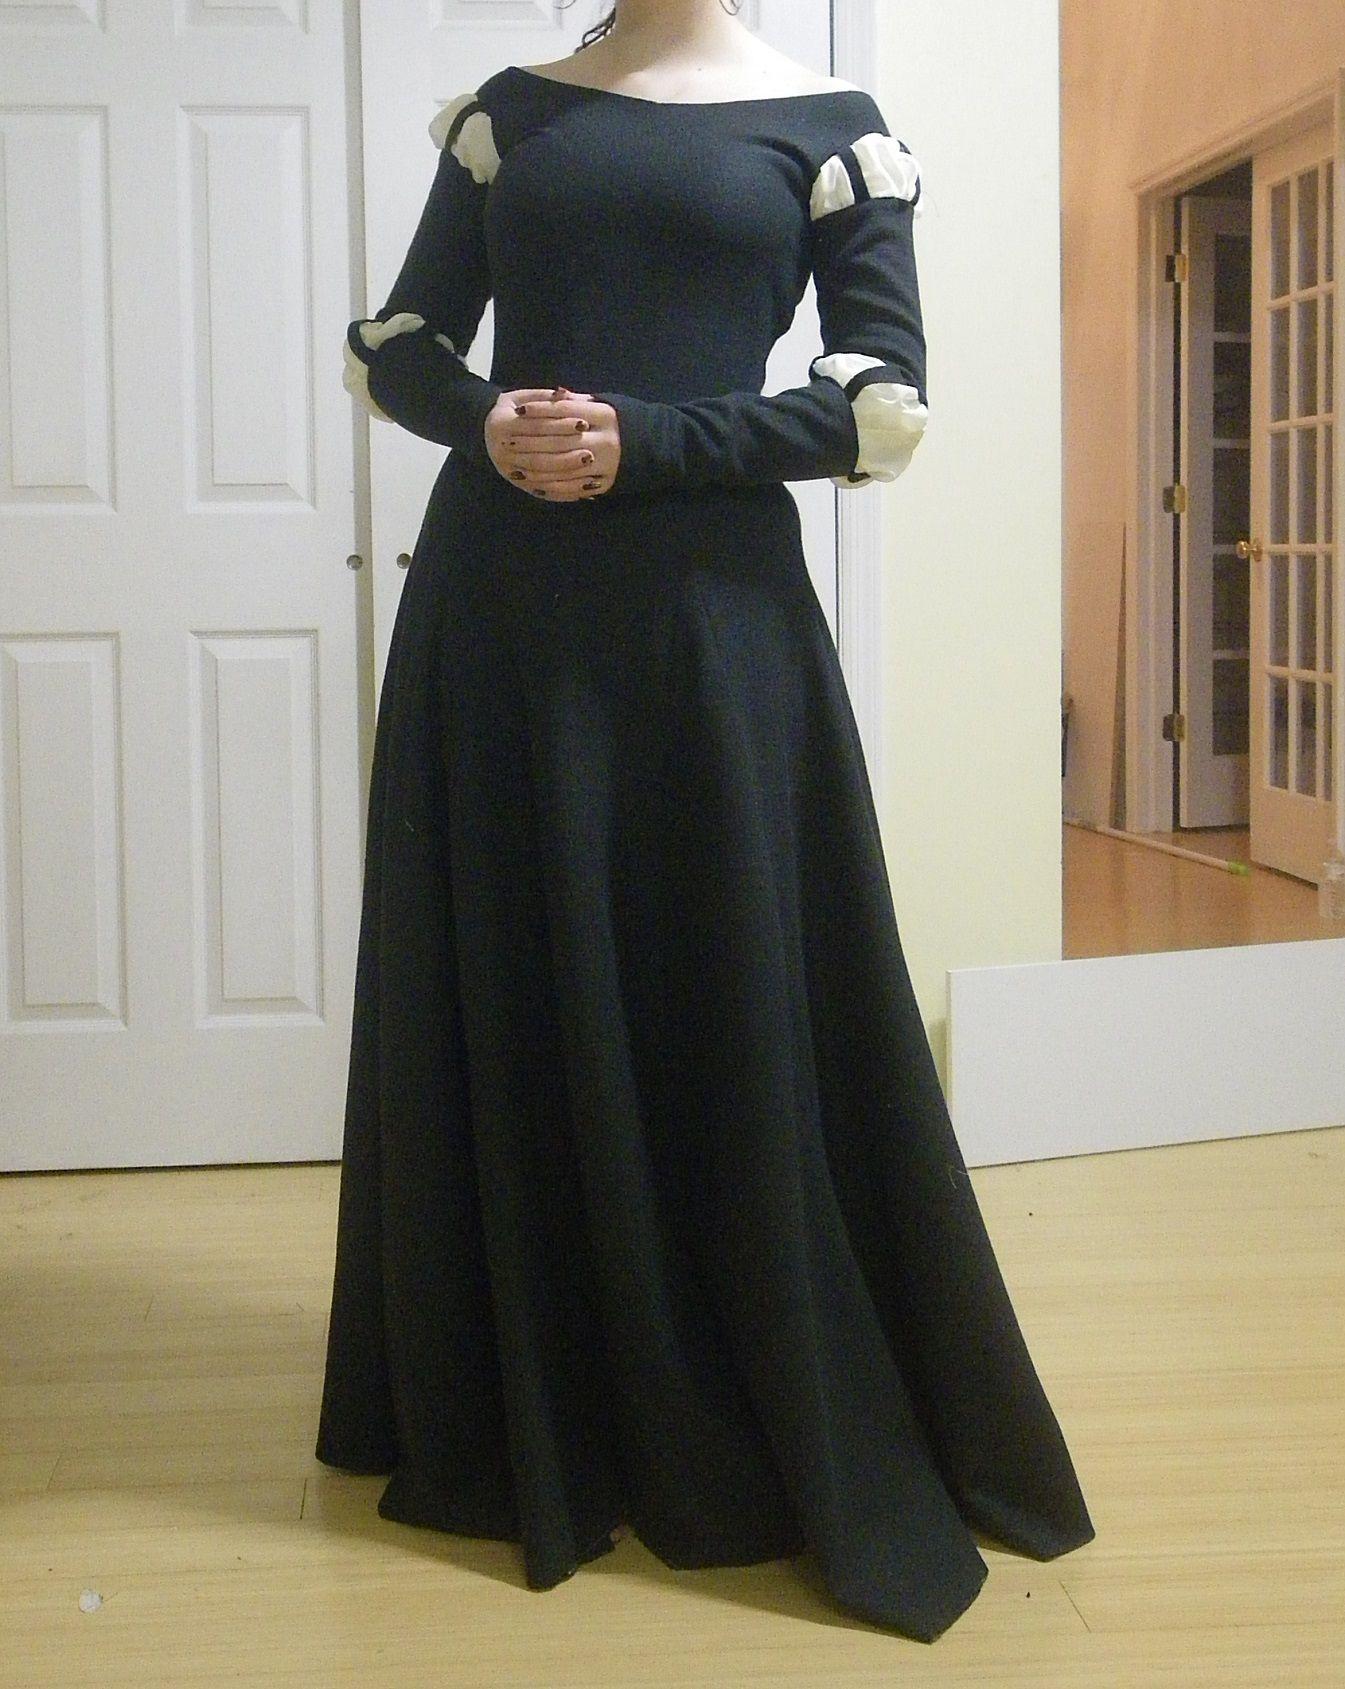 Merida dress images